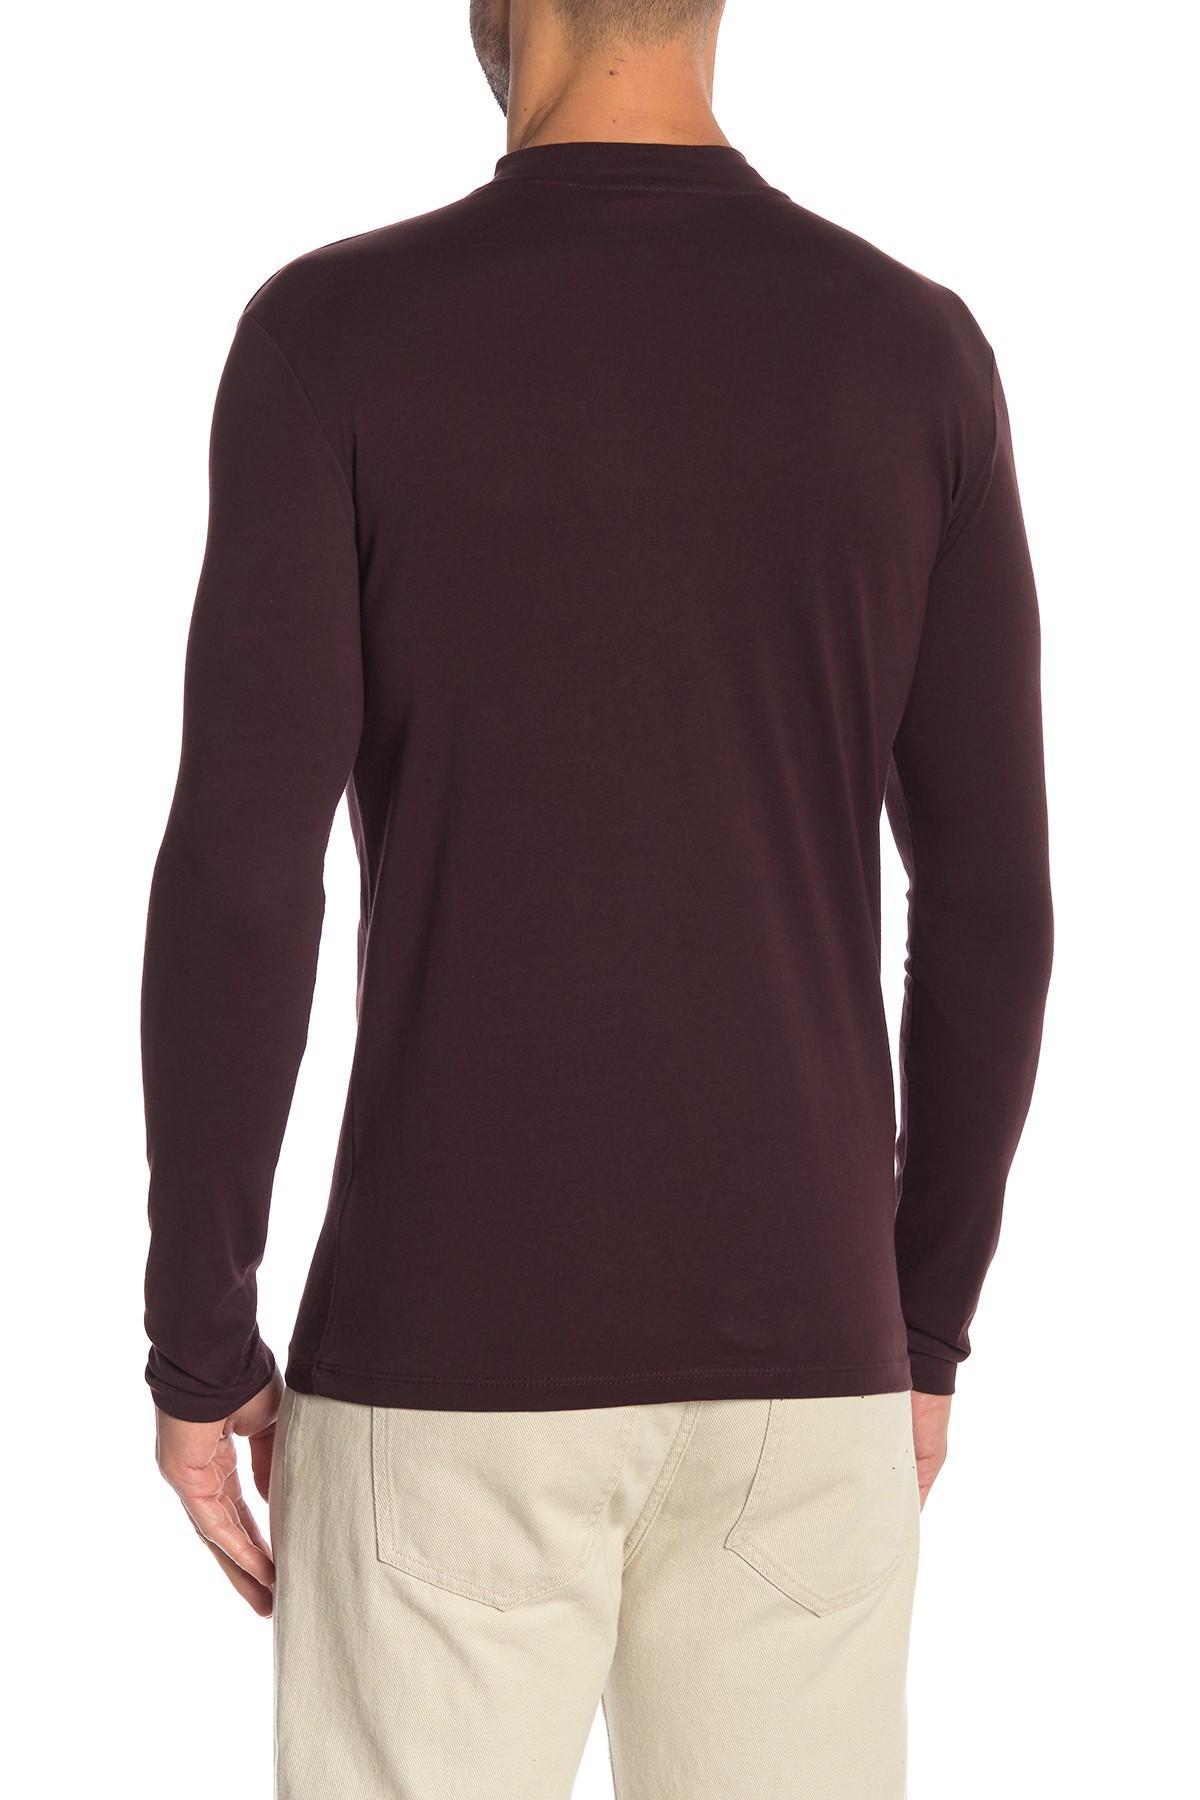 9ce86139 Lindbergh - Purple Mock Neck Long Sleeve Tee for Men - Lyst. View fullscreen